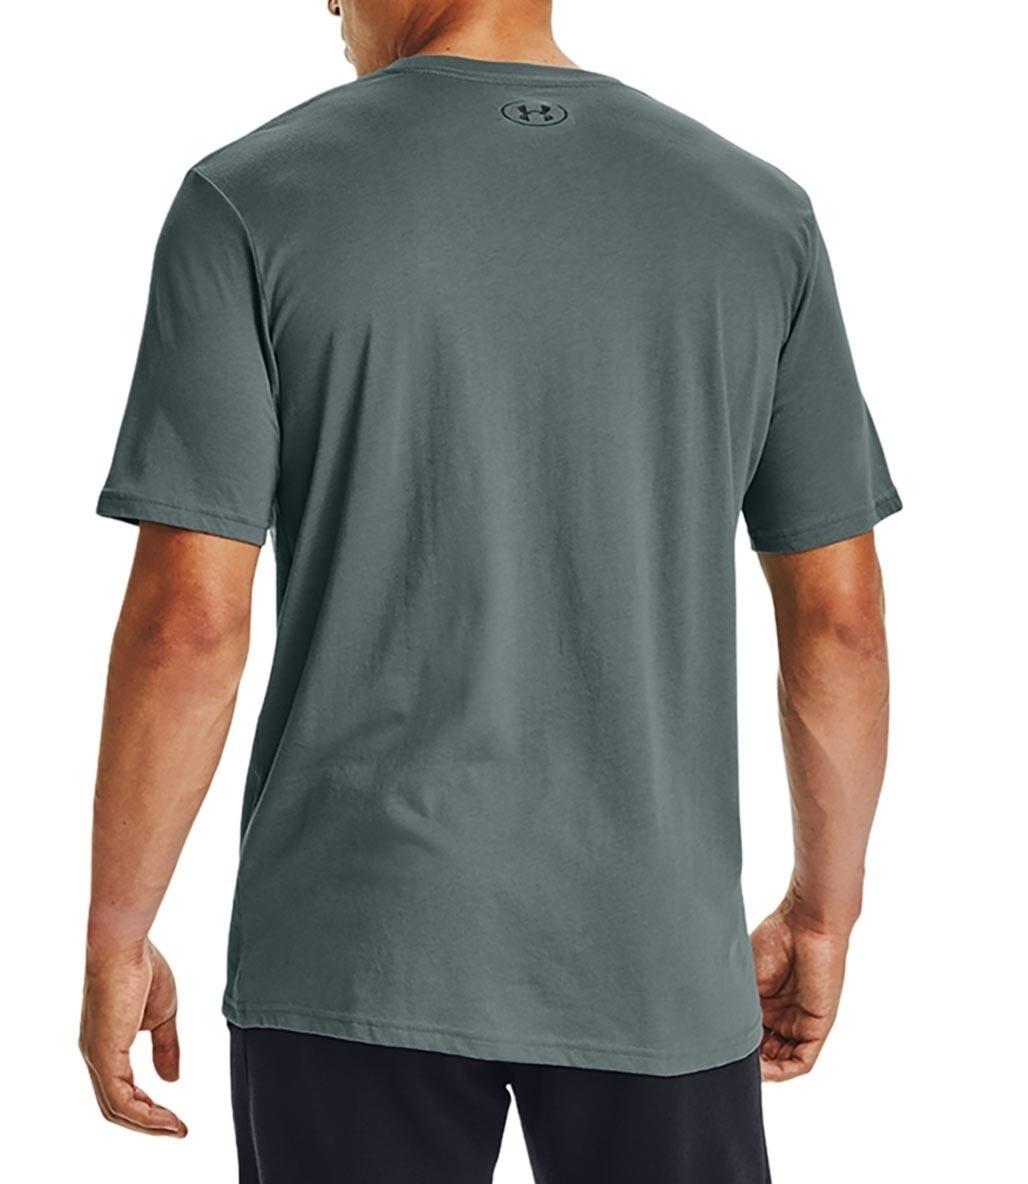 Under Armour Always Under Armour T-Shirt Mavi Sarı